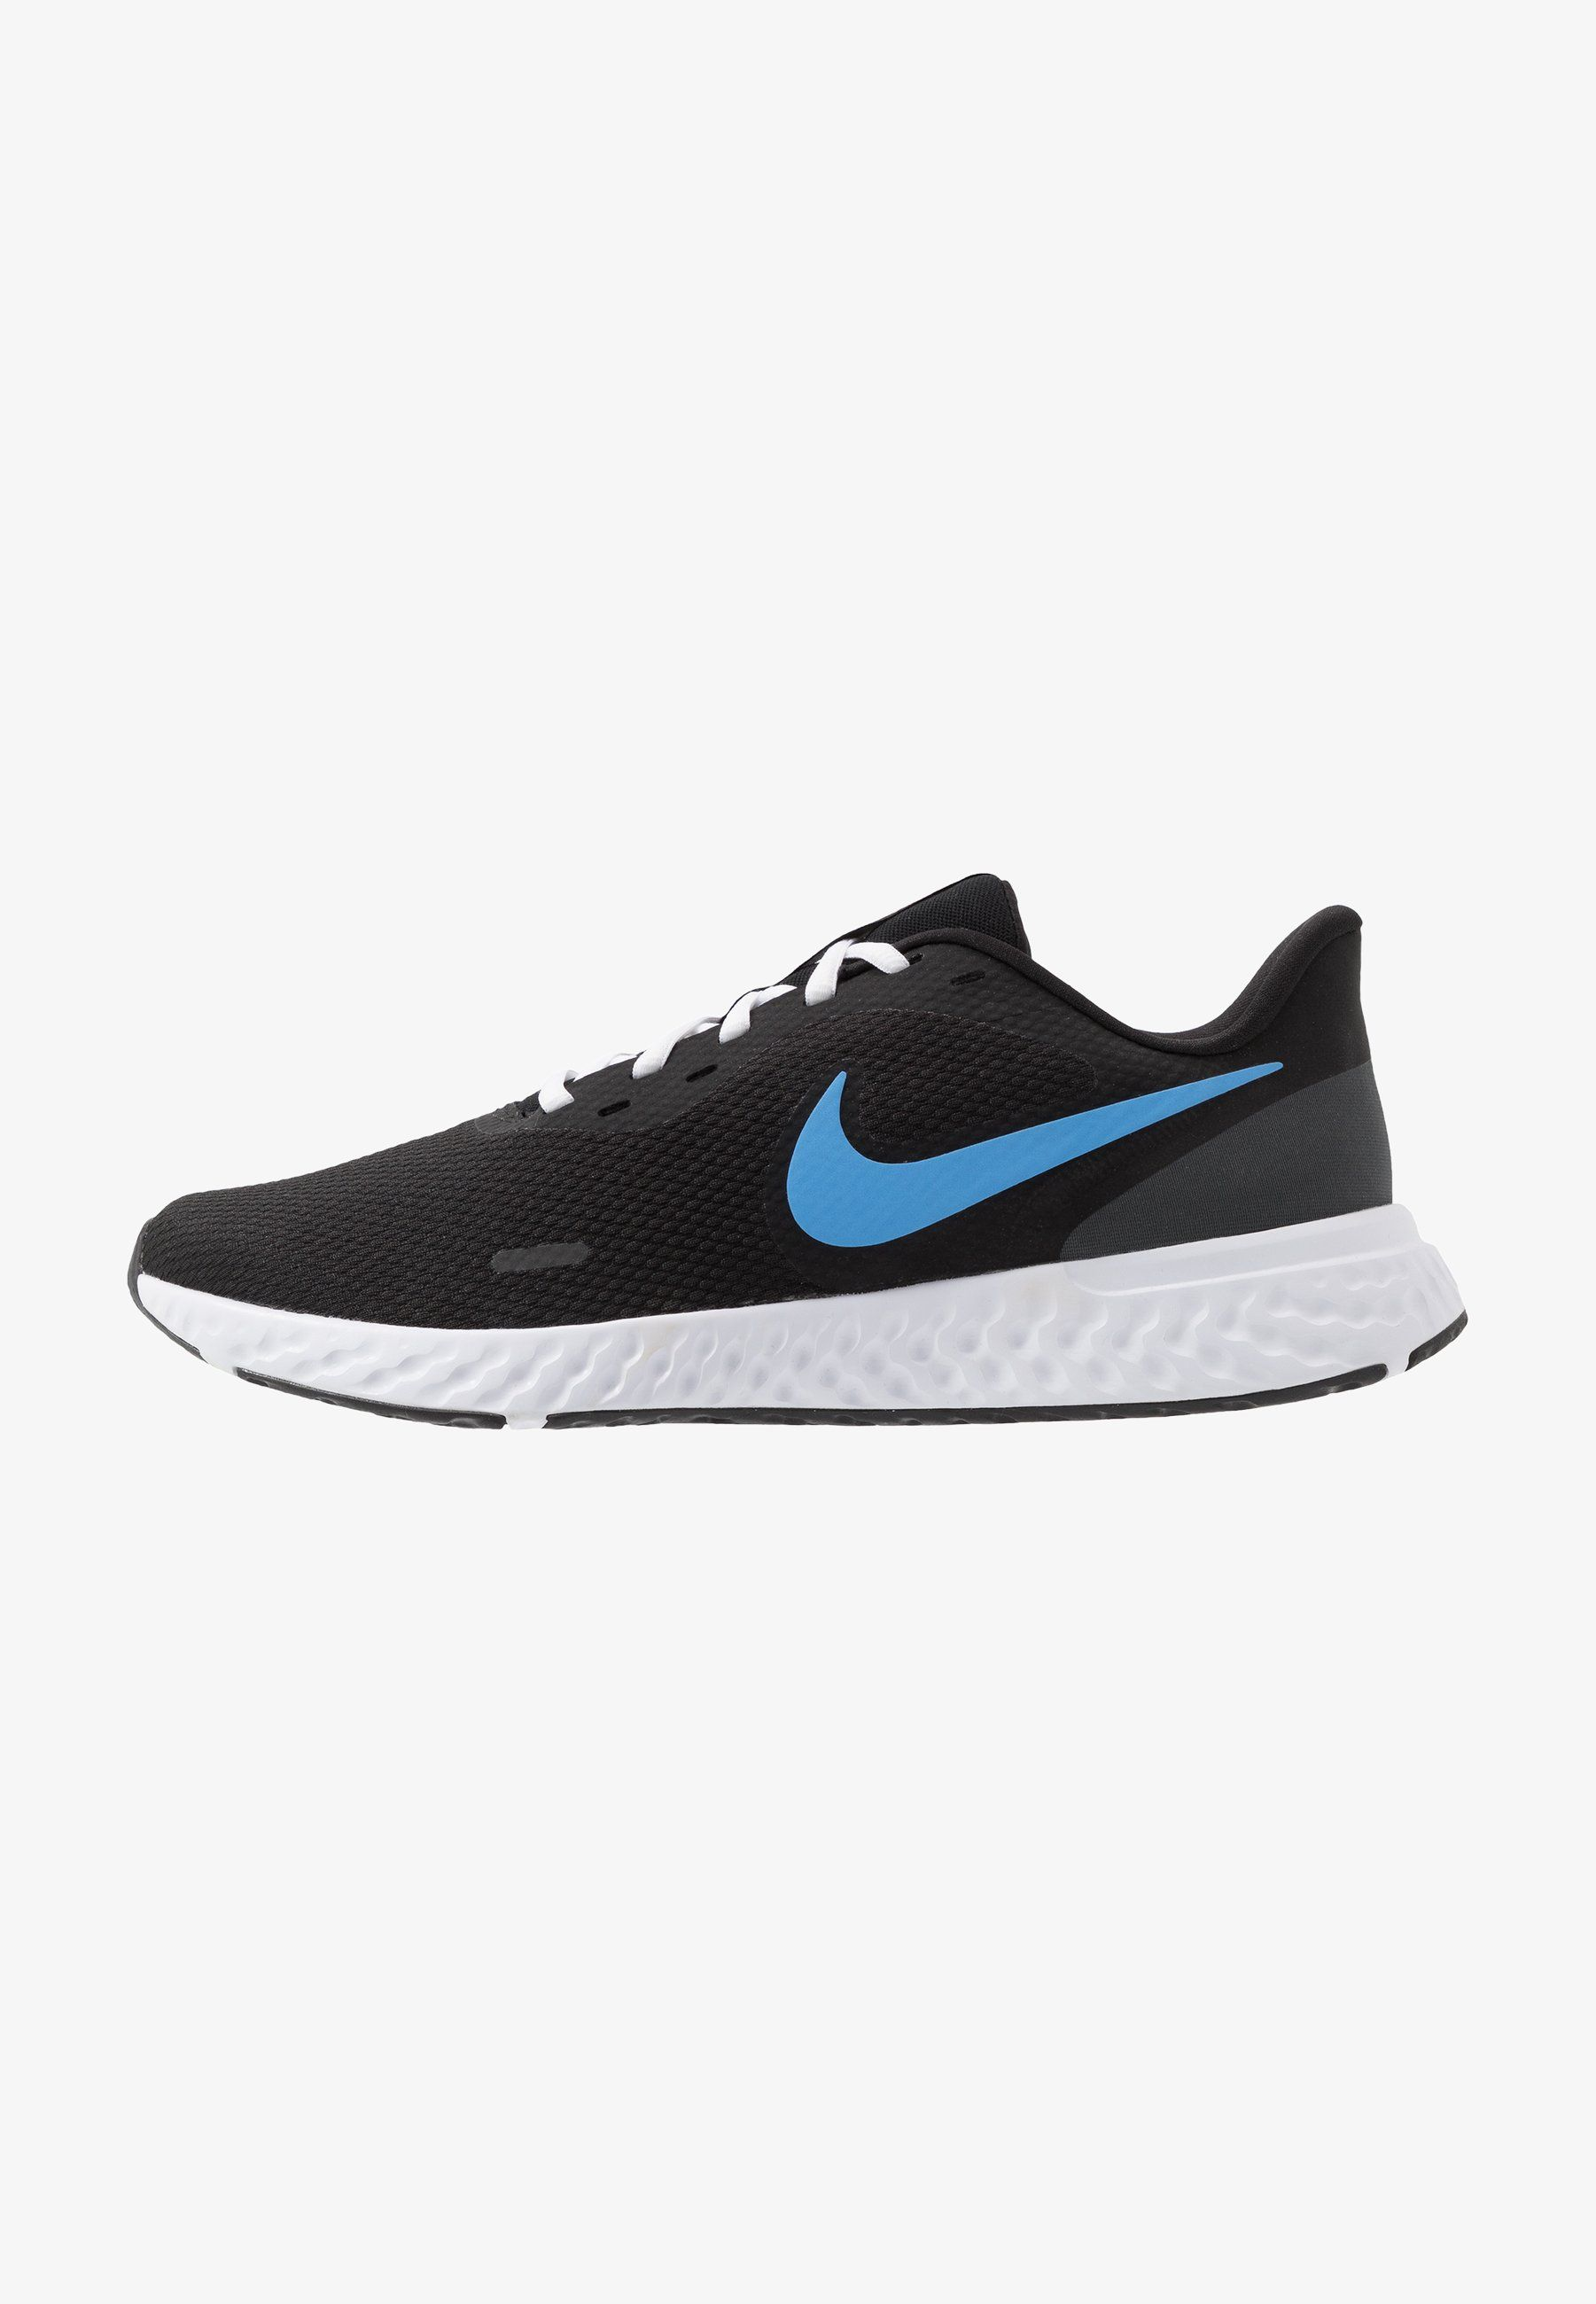 región Intención fuerte  Nike Performance REVOLUTION 5 - Zapatillas de running neutras -  black/university blue/laser orange/white/anthracite - Zaland… en 2020 |  Zapatillas running, Nike, Zapatillas